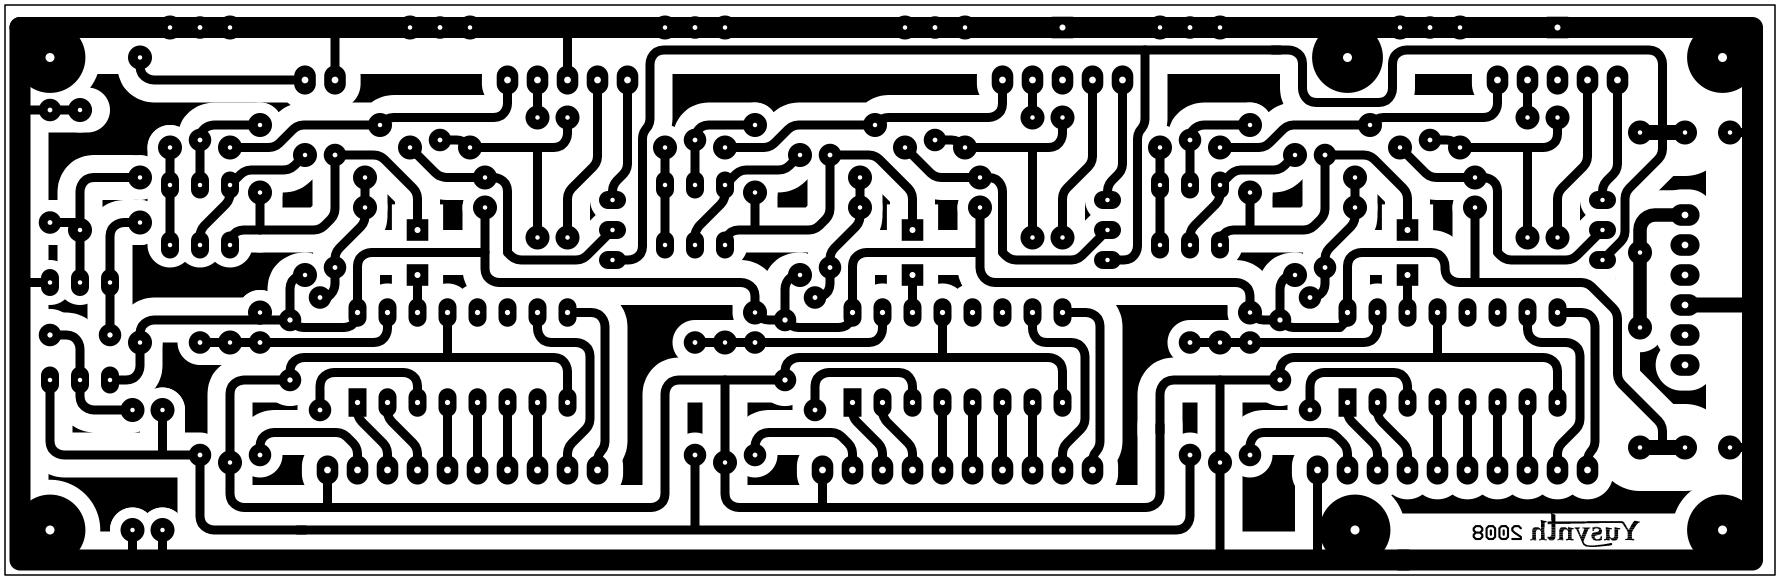 Fein Pcb Diagrammsoftware Fotos - Schaltplan Serie Circuit ...